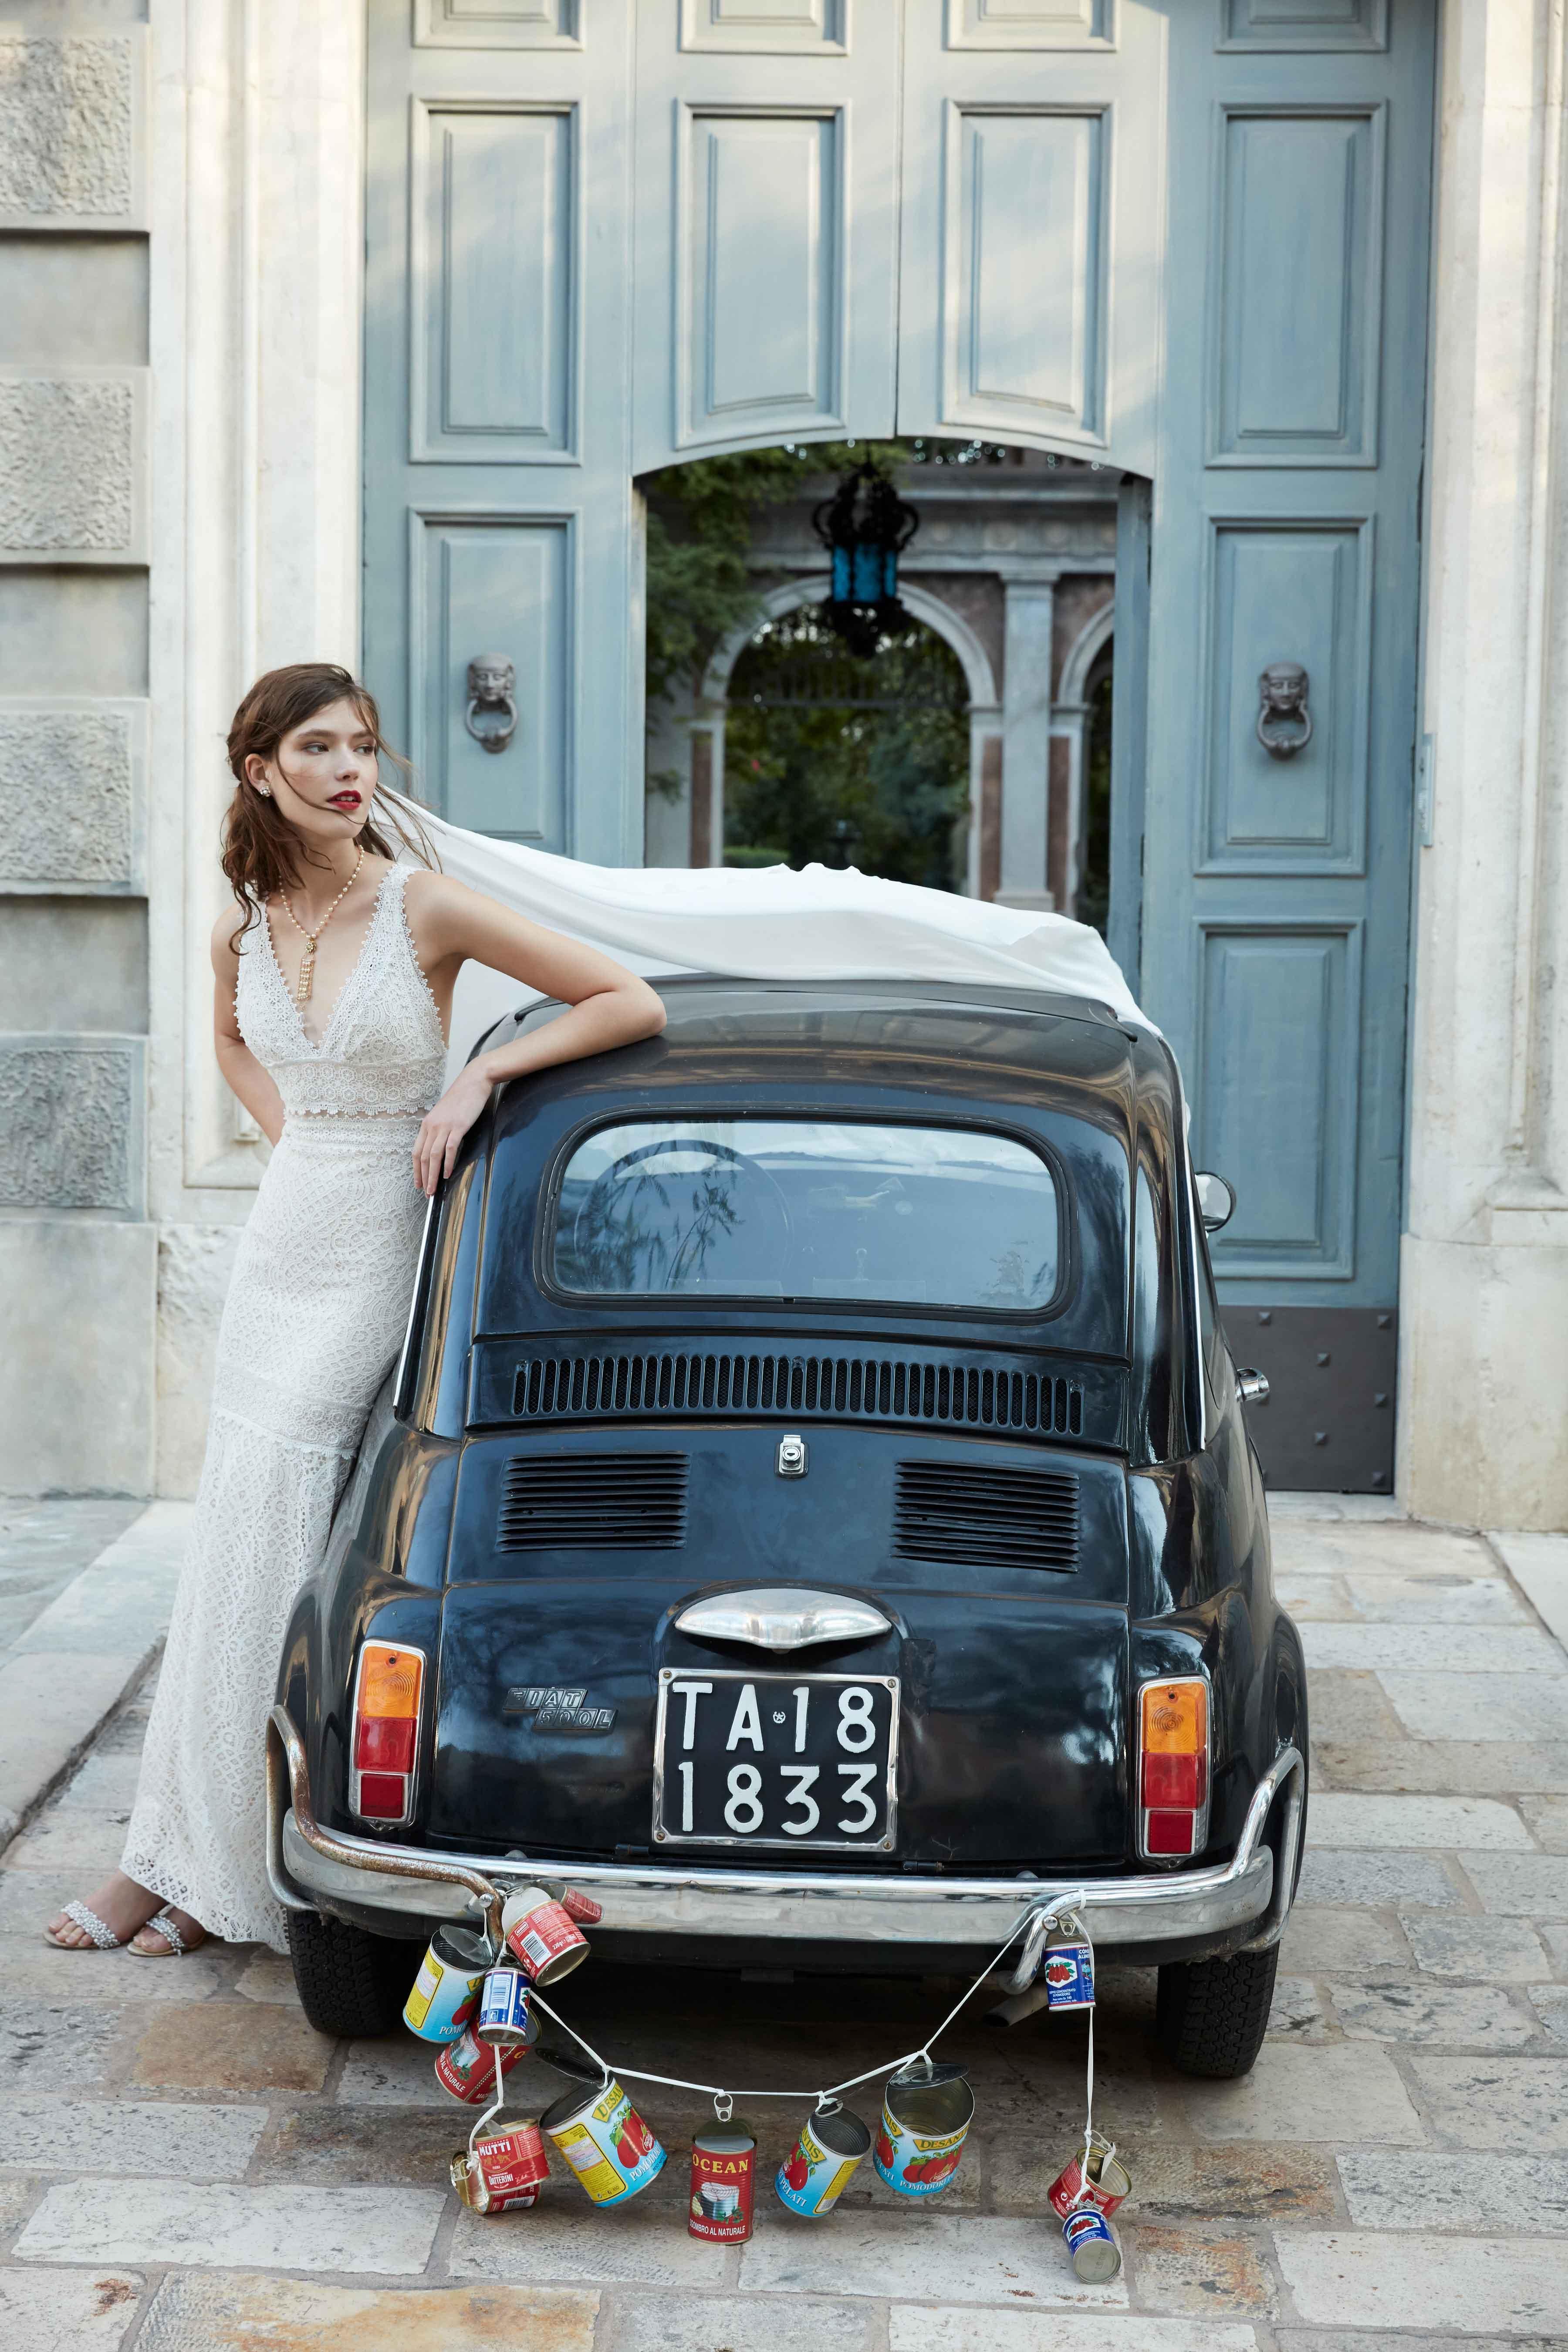 Kiely wedding dress BHLDN small car with cans just married italy BHLDN